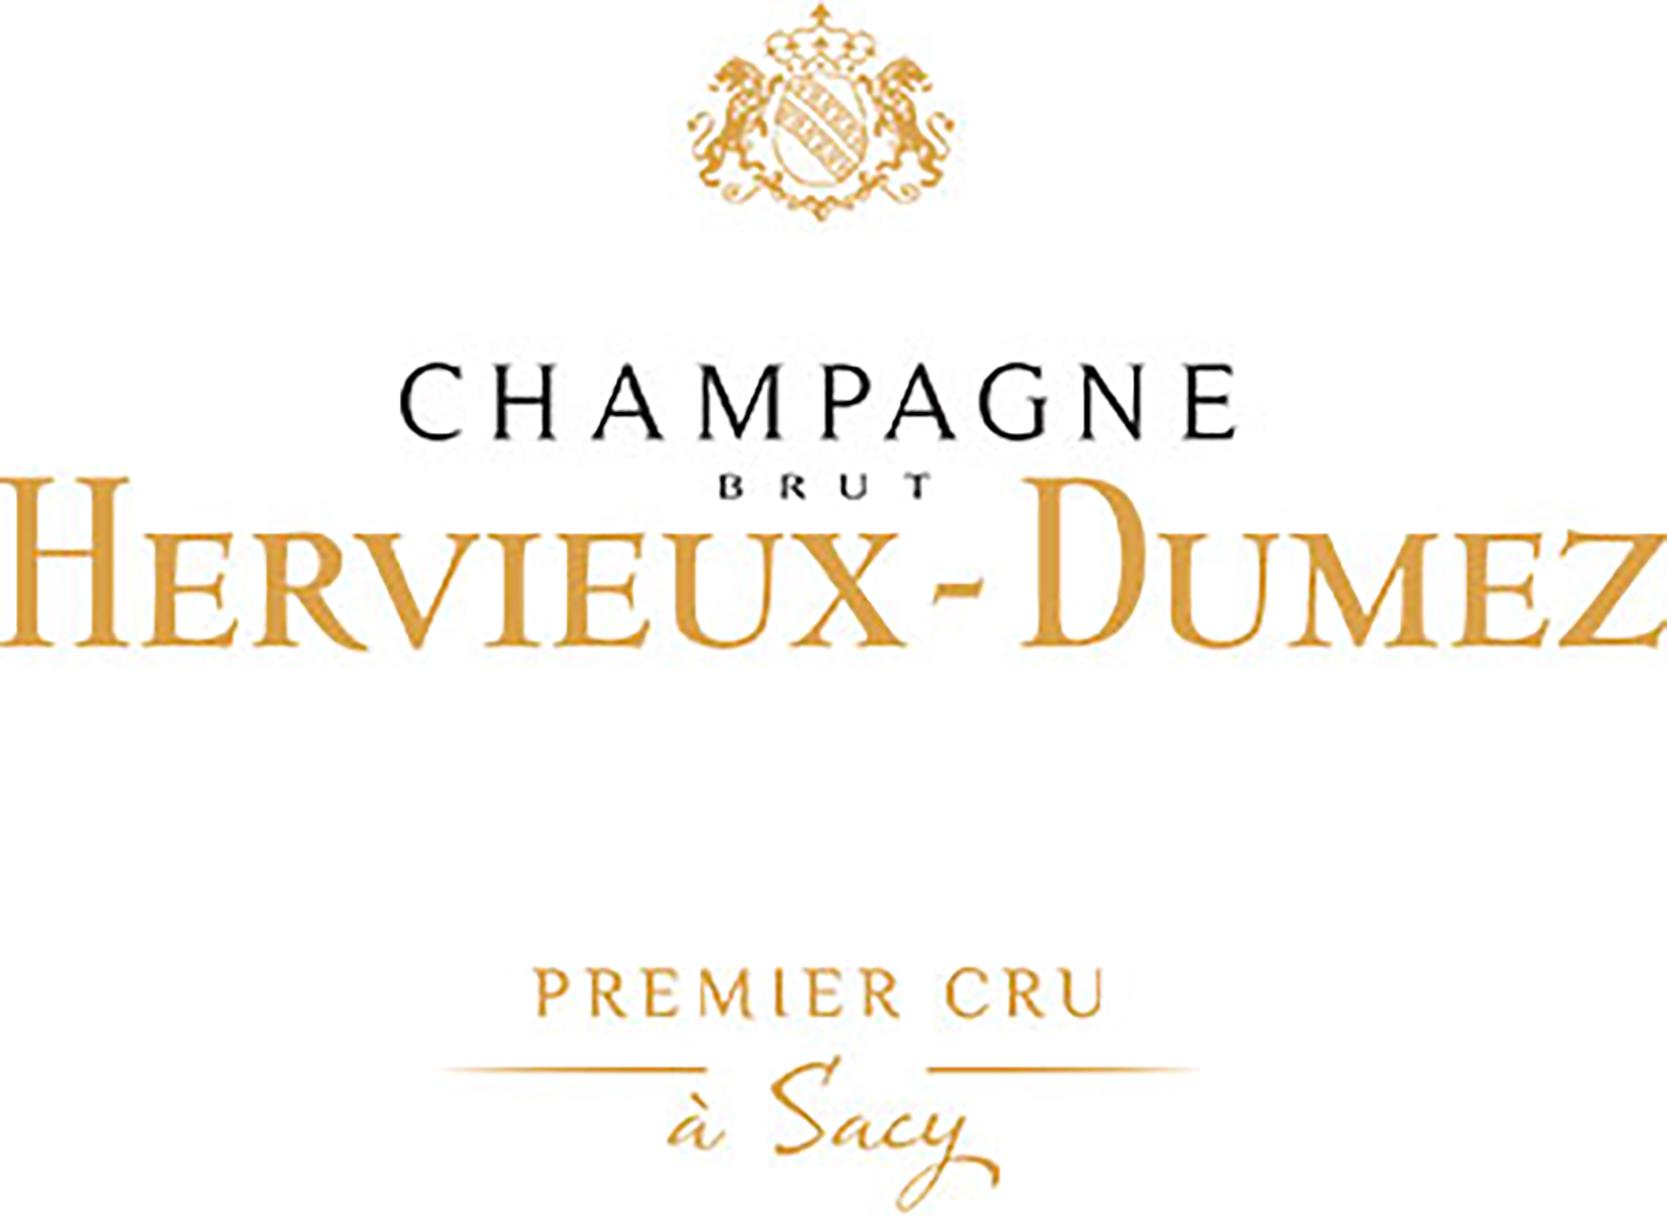 hervieux-dumez logo